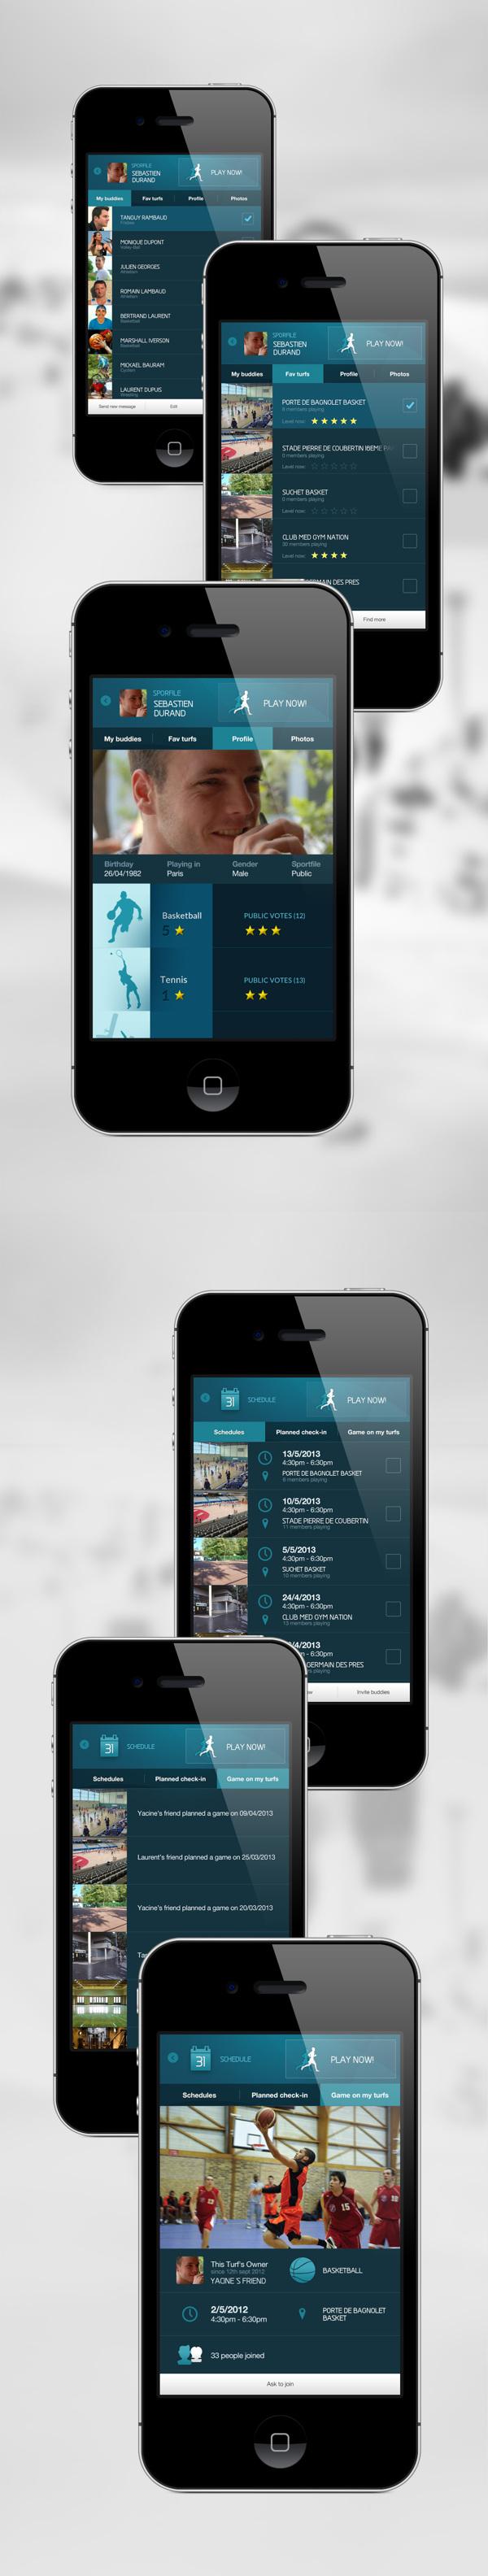 Best App mobile design